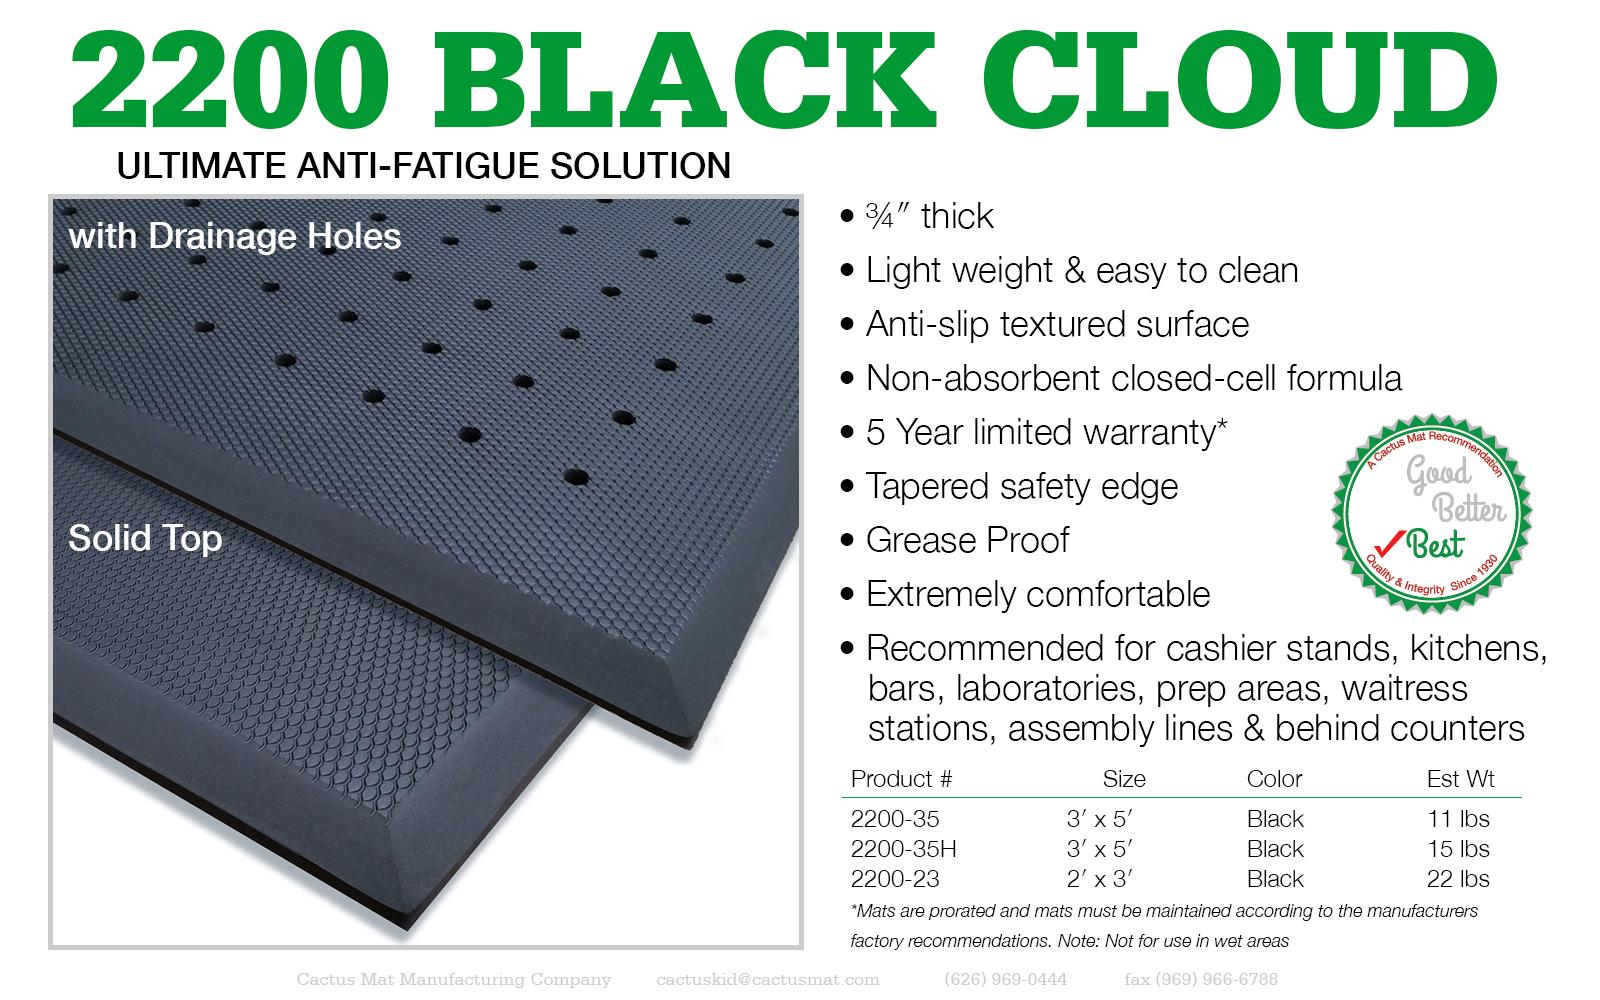 2200_BlackCloud_1600x1000.jpg